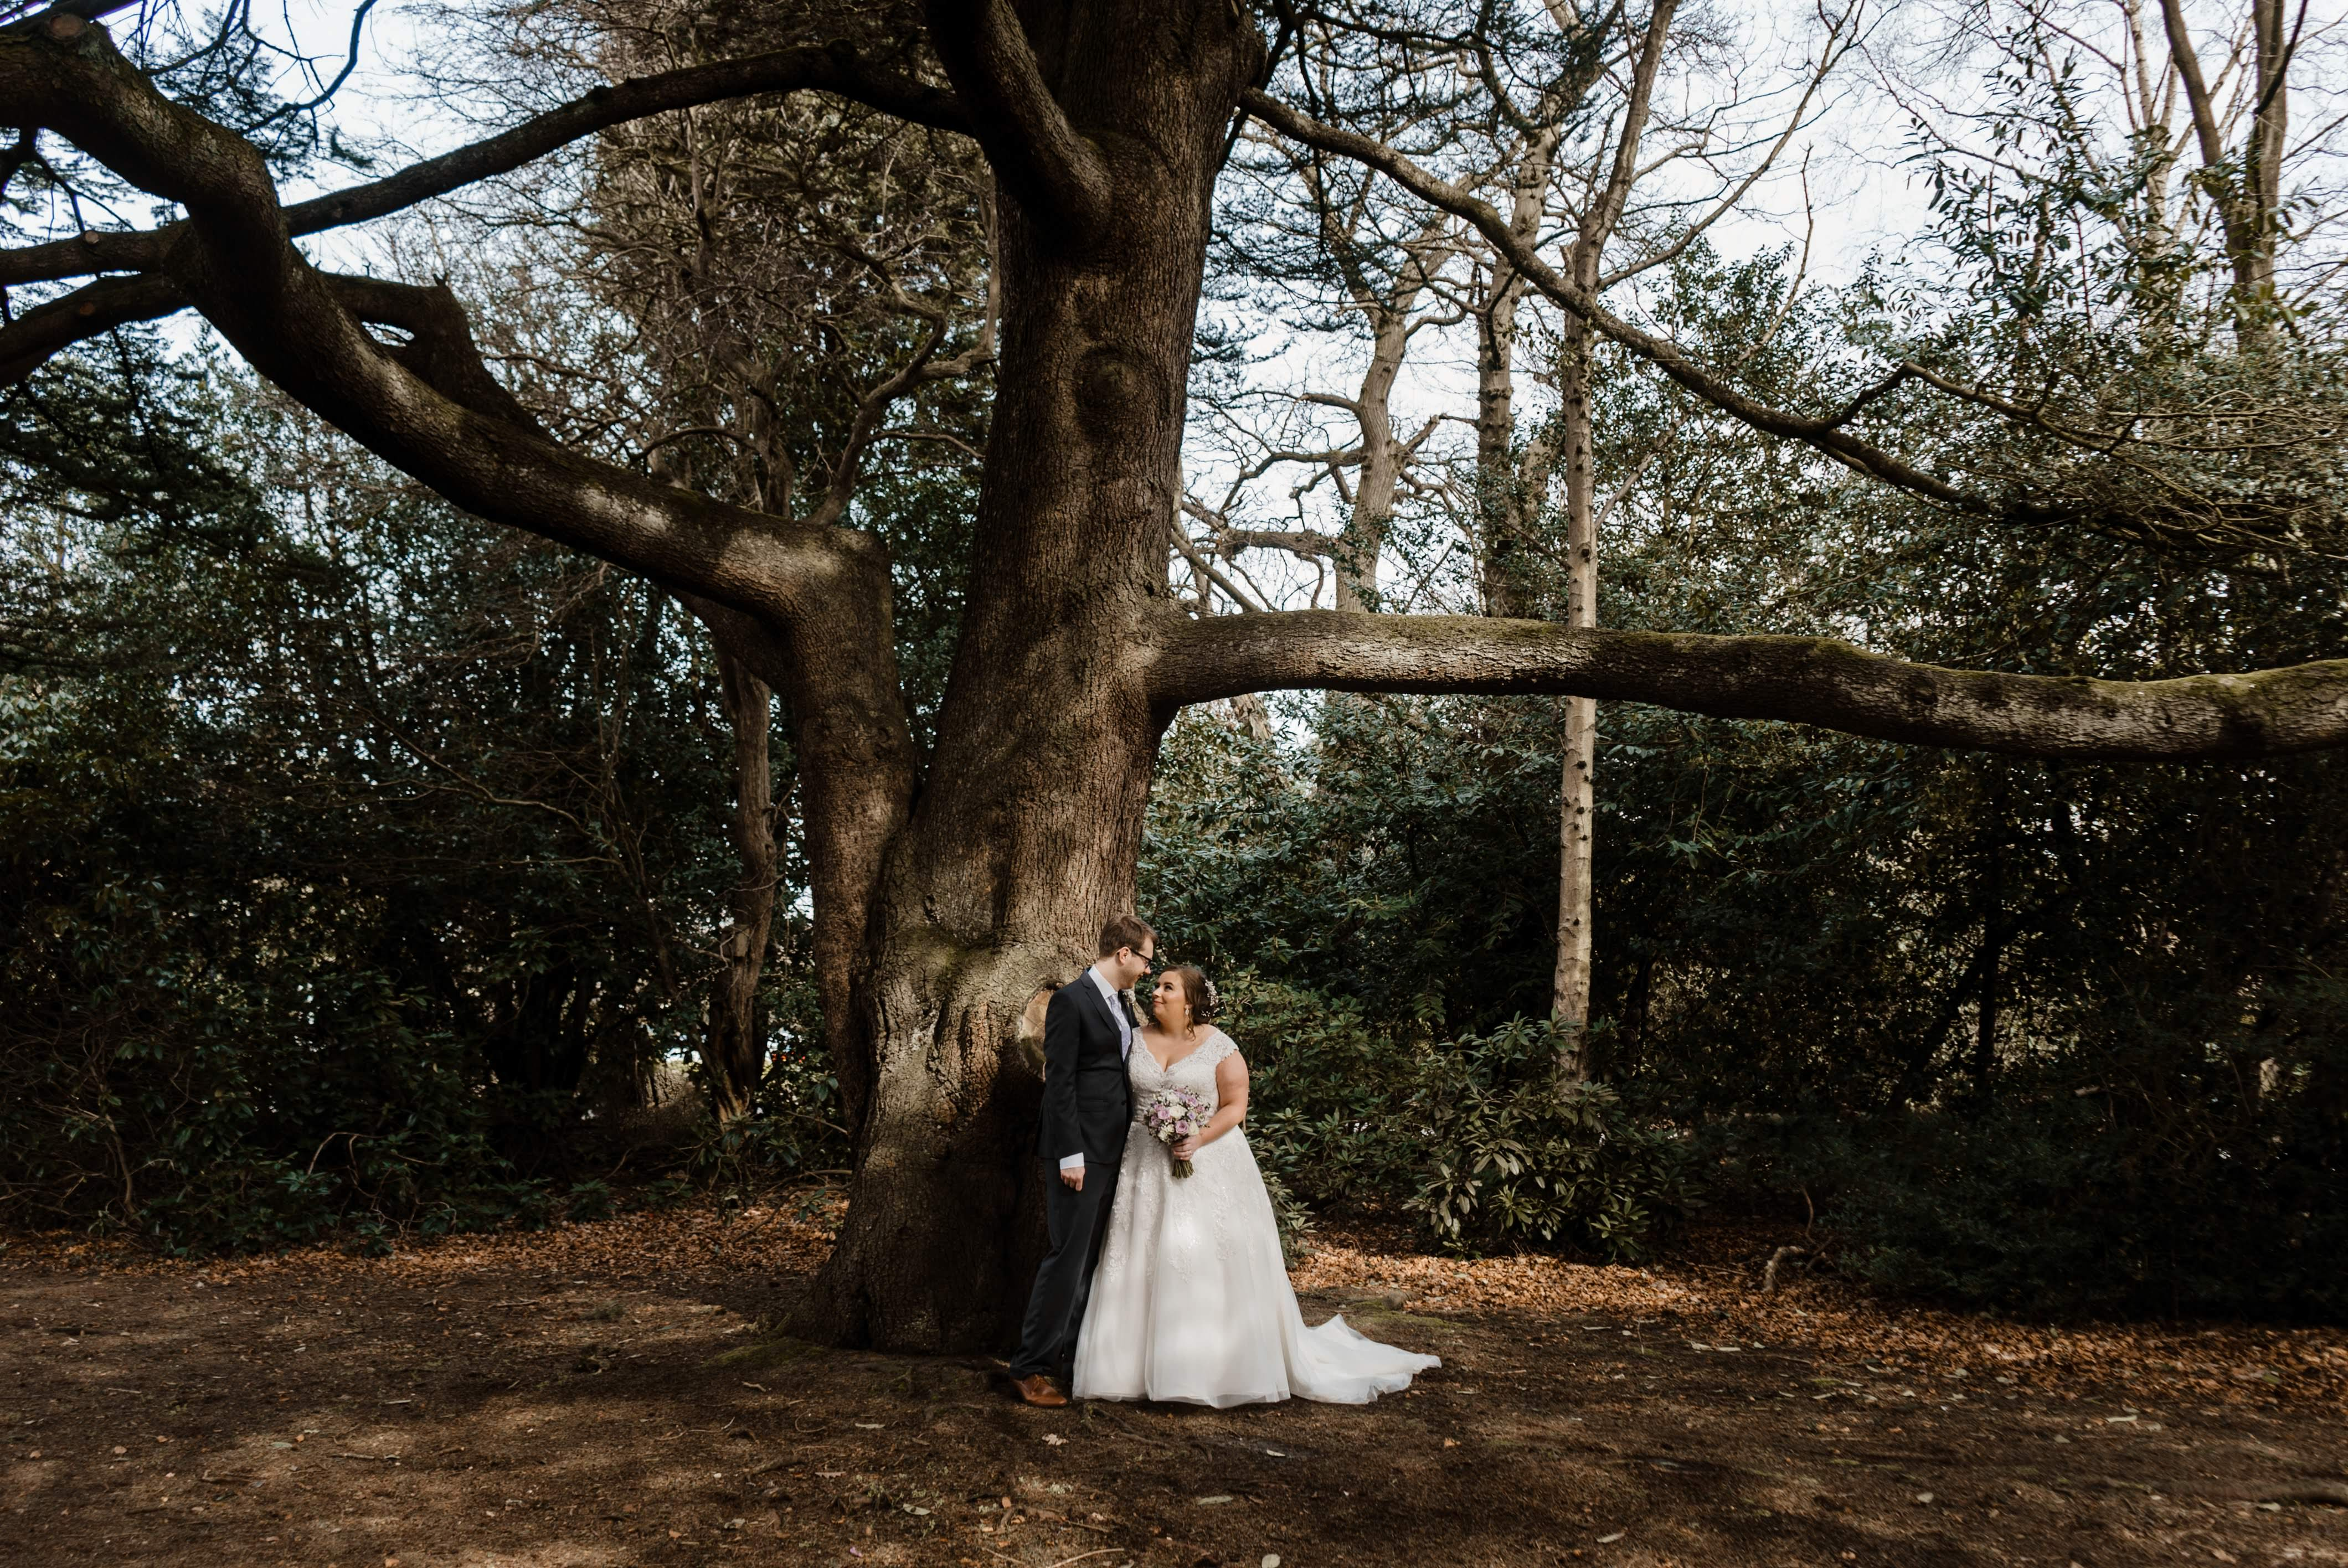 Weetwood Hall Wedding Leeds 6 - Sneak Peek - Jessica & Jonathan  Weetwood Hall Wedding Leeds